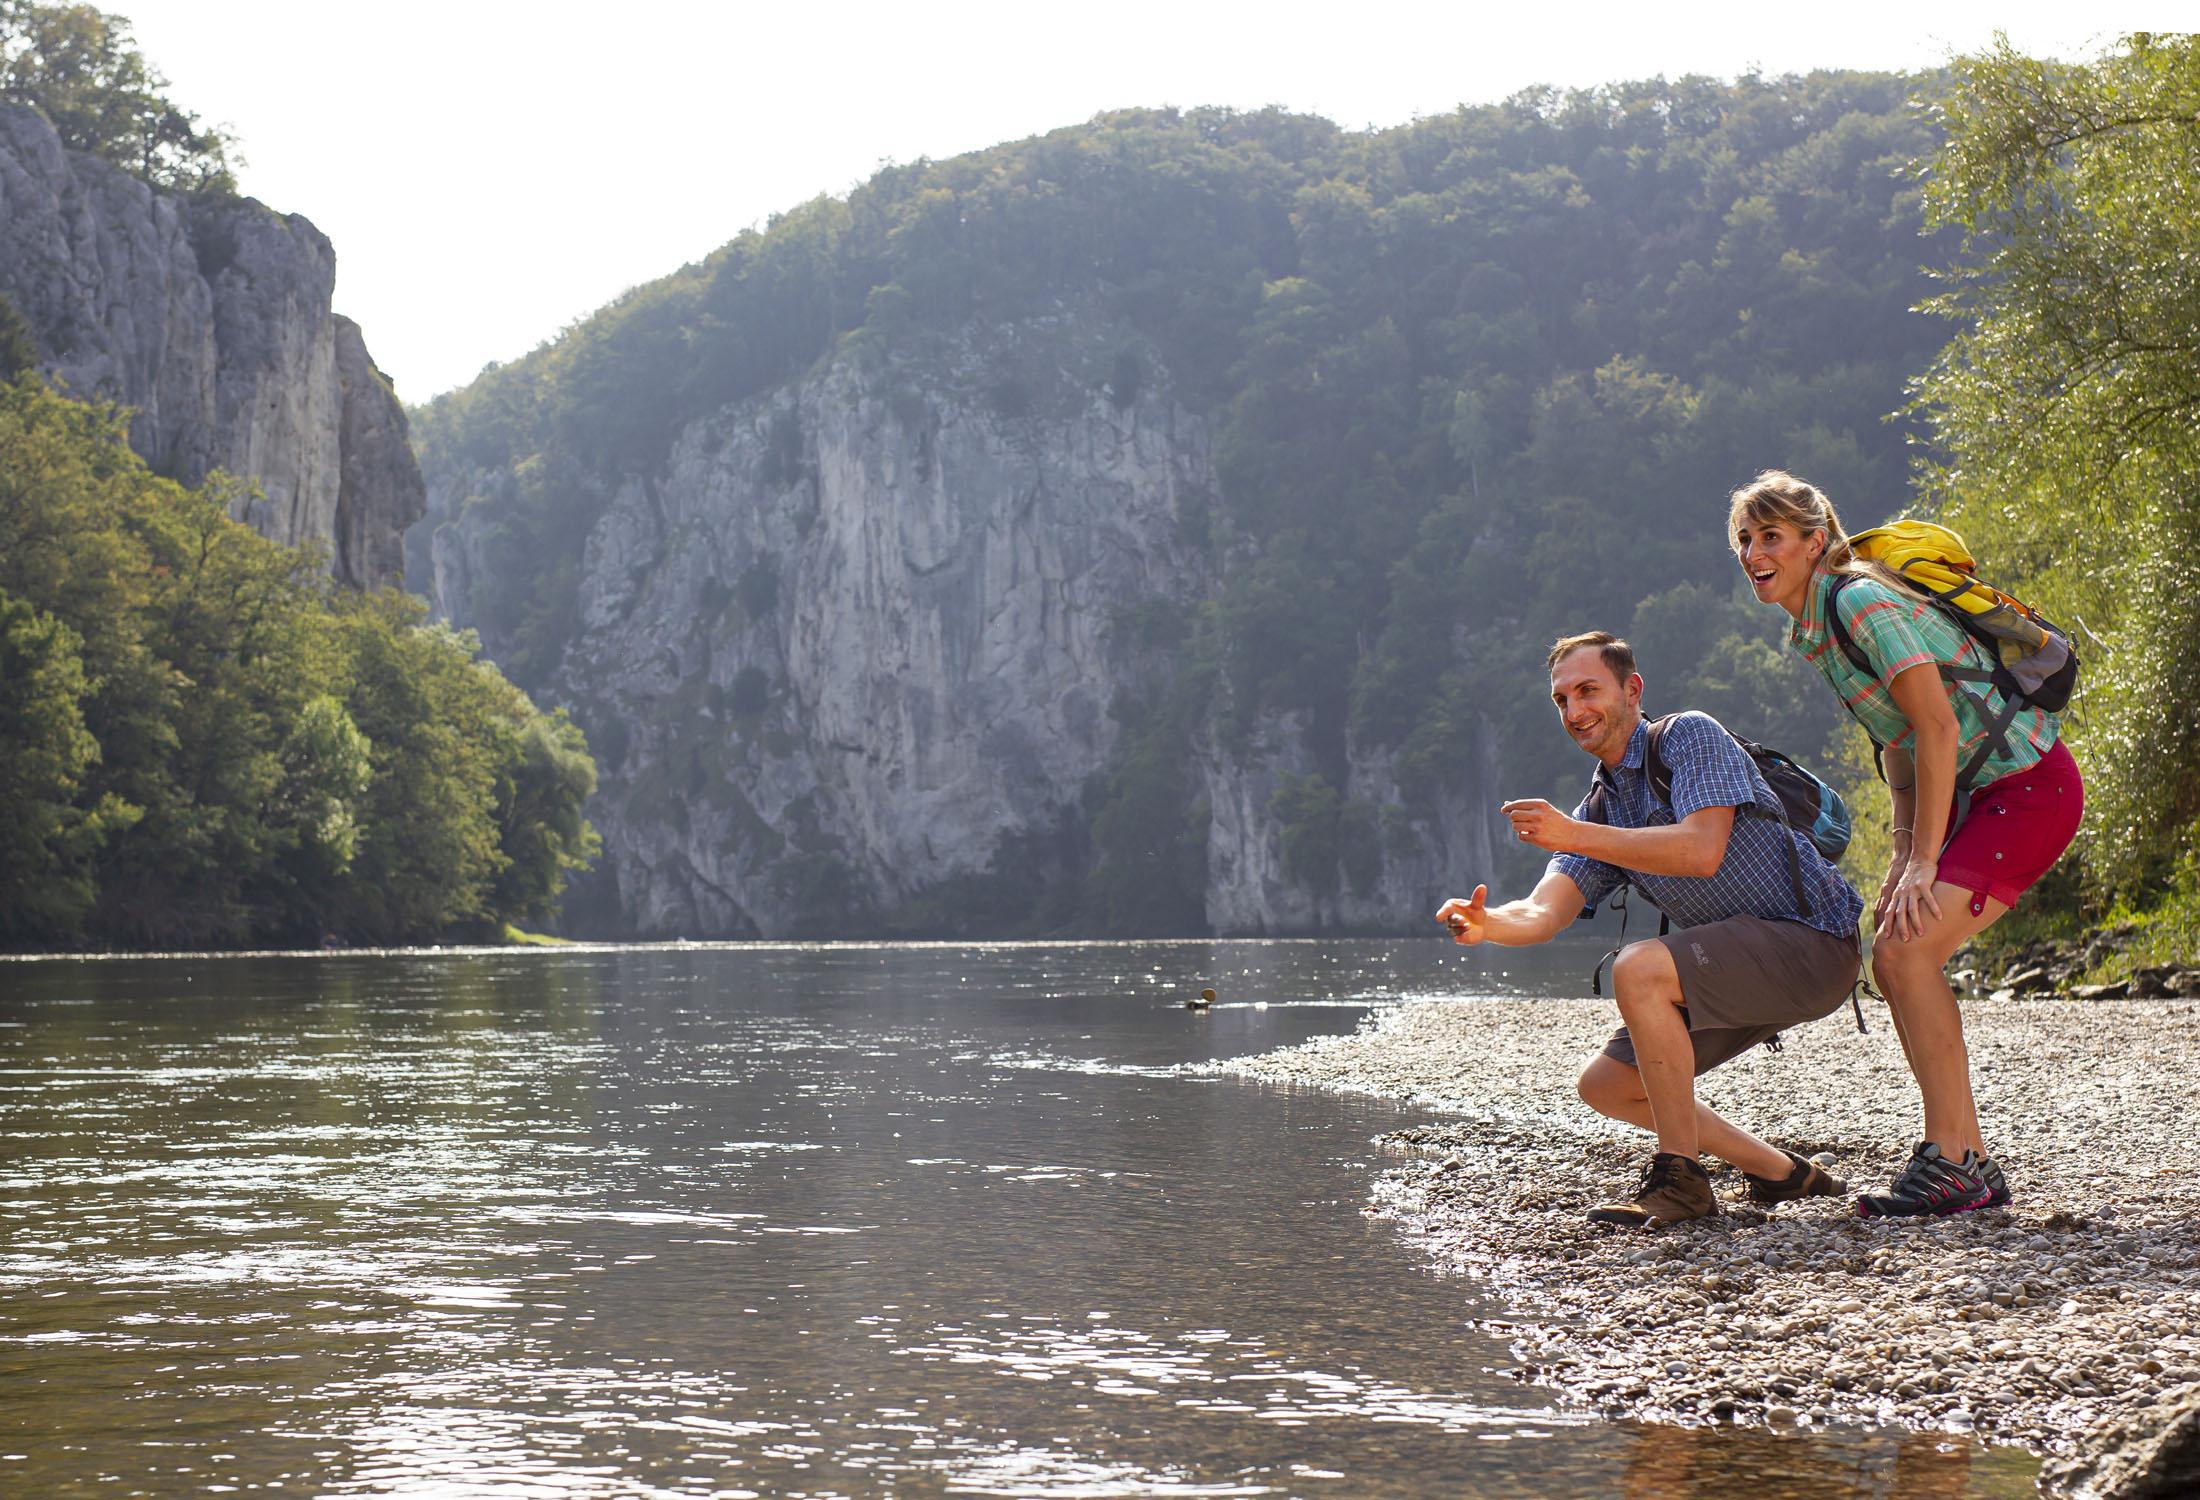 At the Danube river.